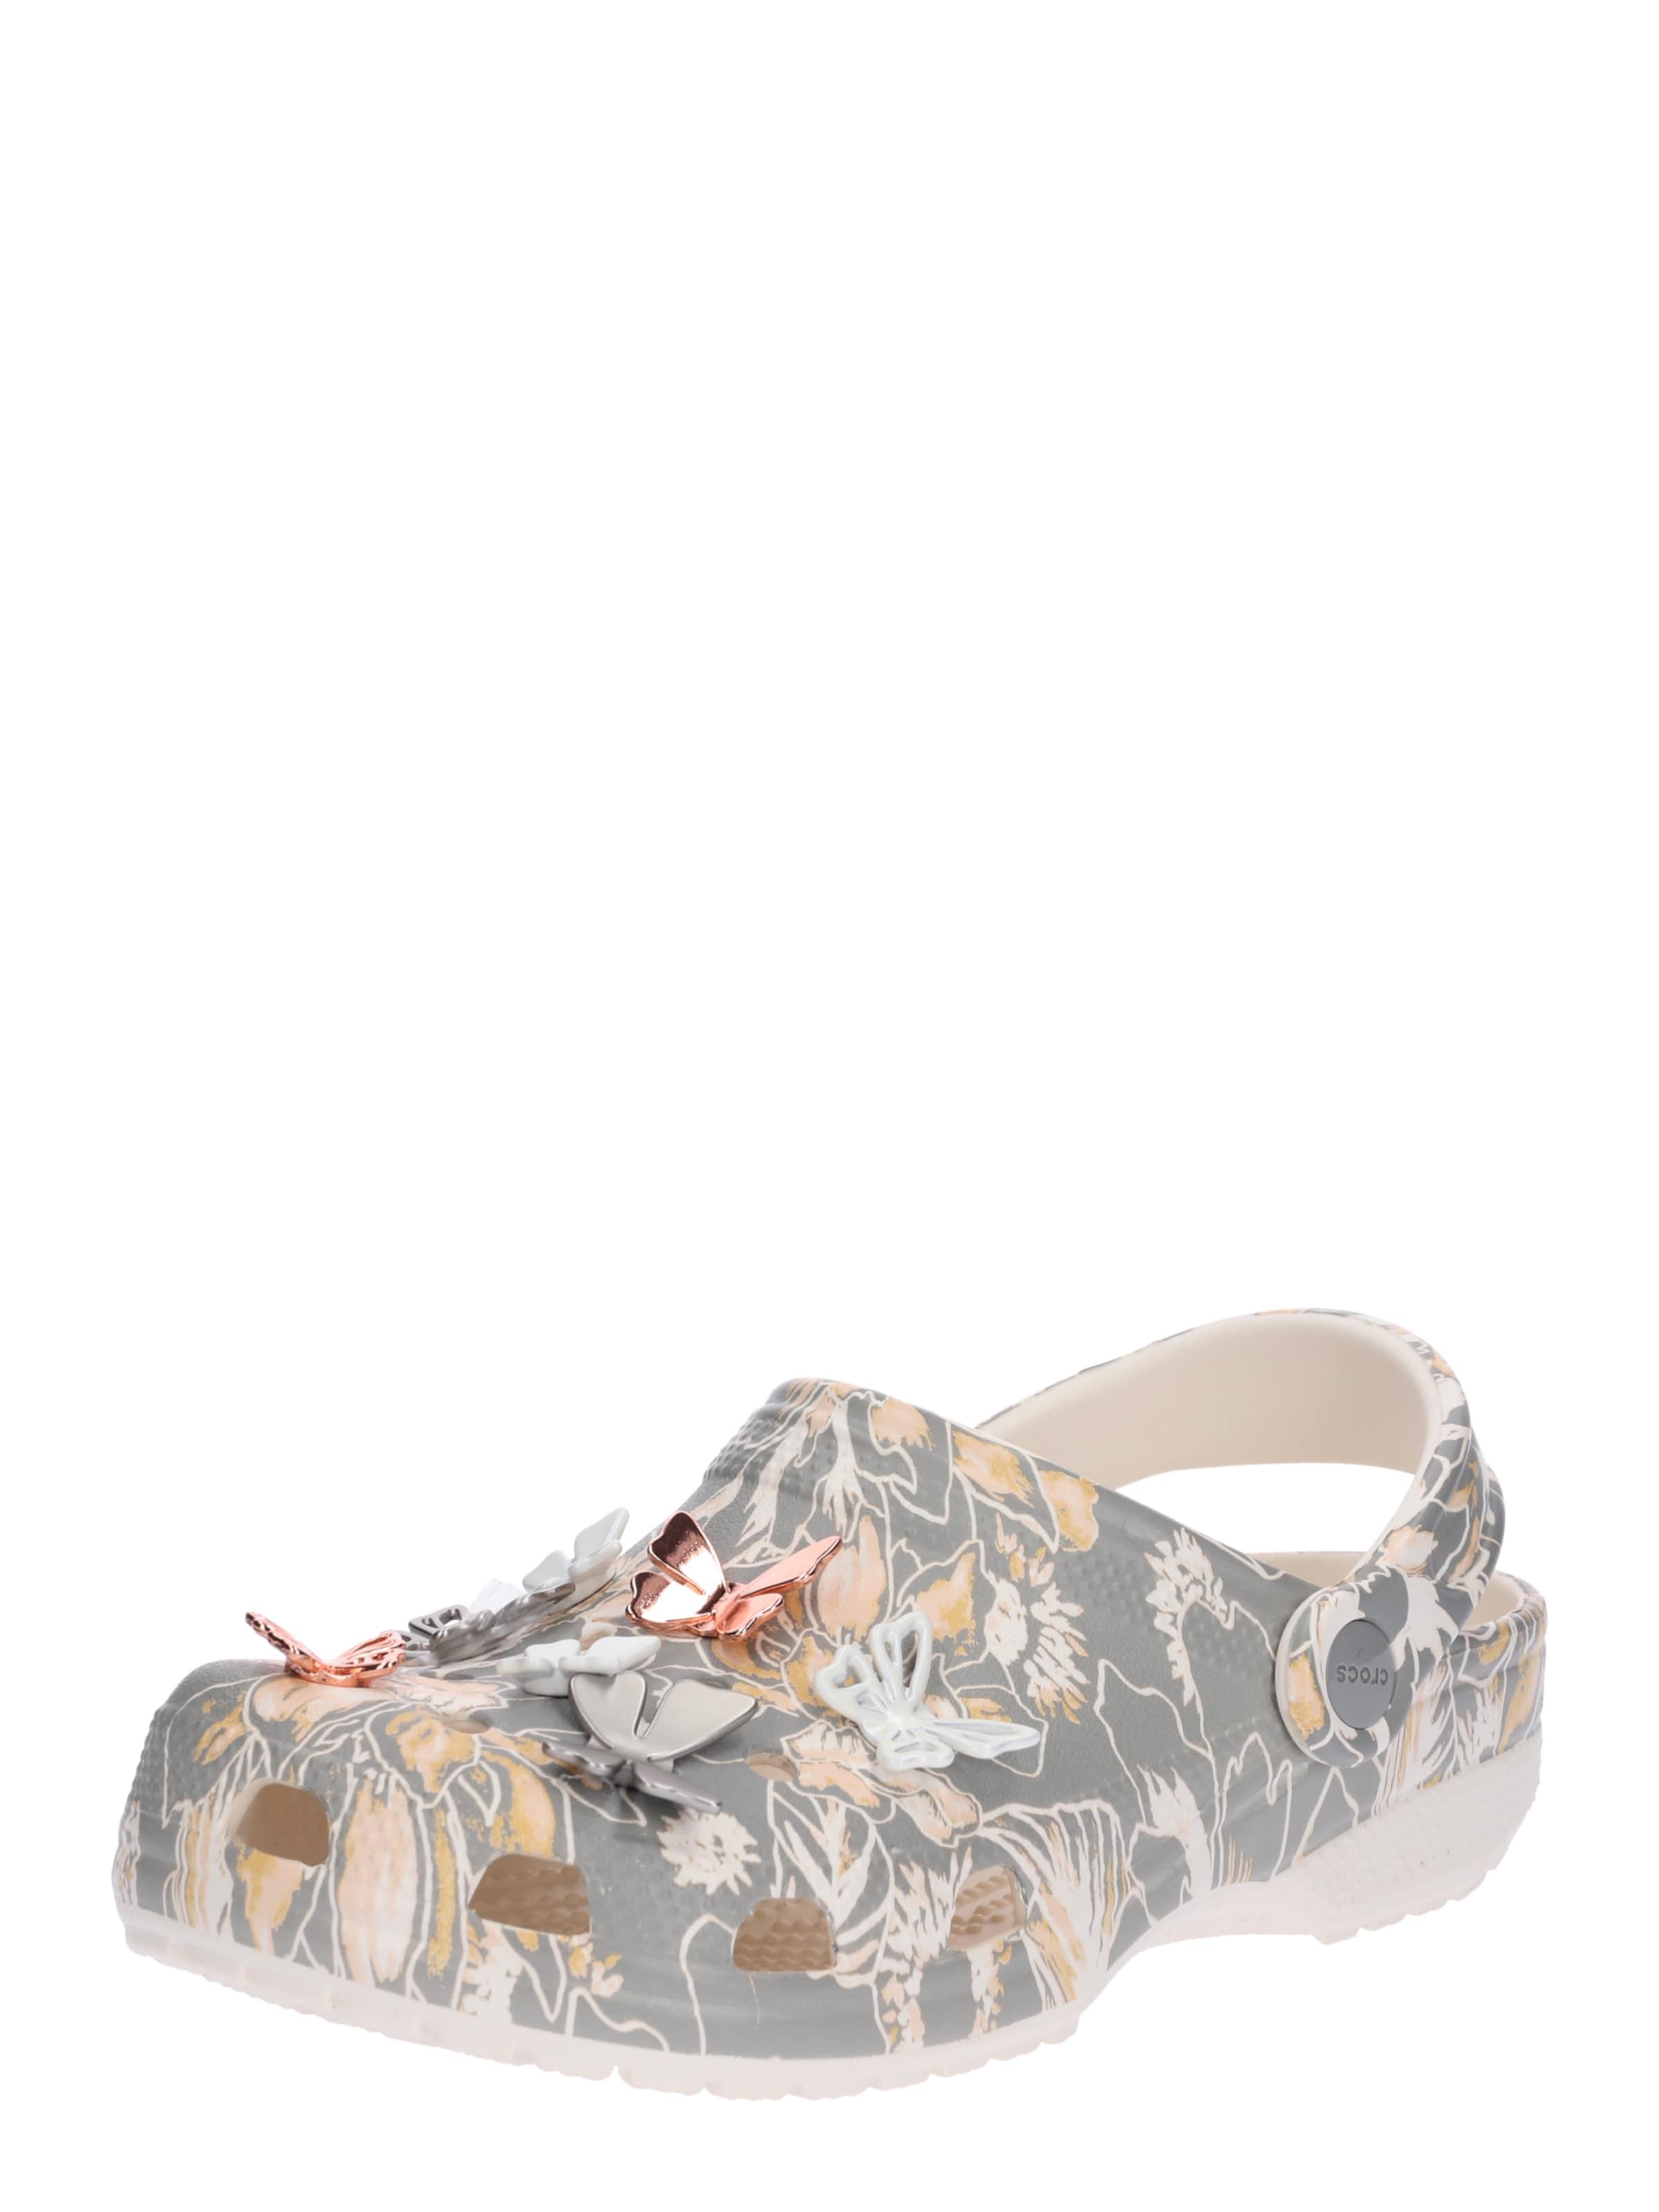 Crocs | Sandale mit Blumenprint Blumenprint Blumenprint c0fa2d